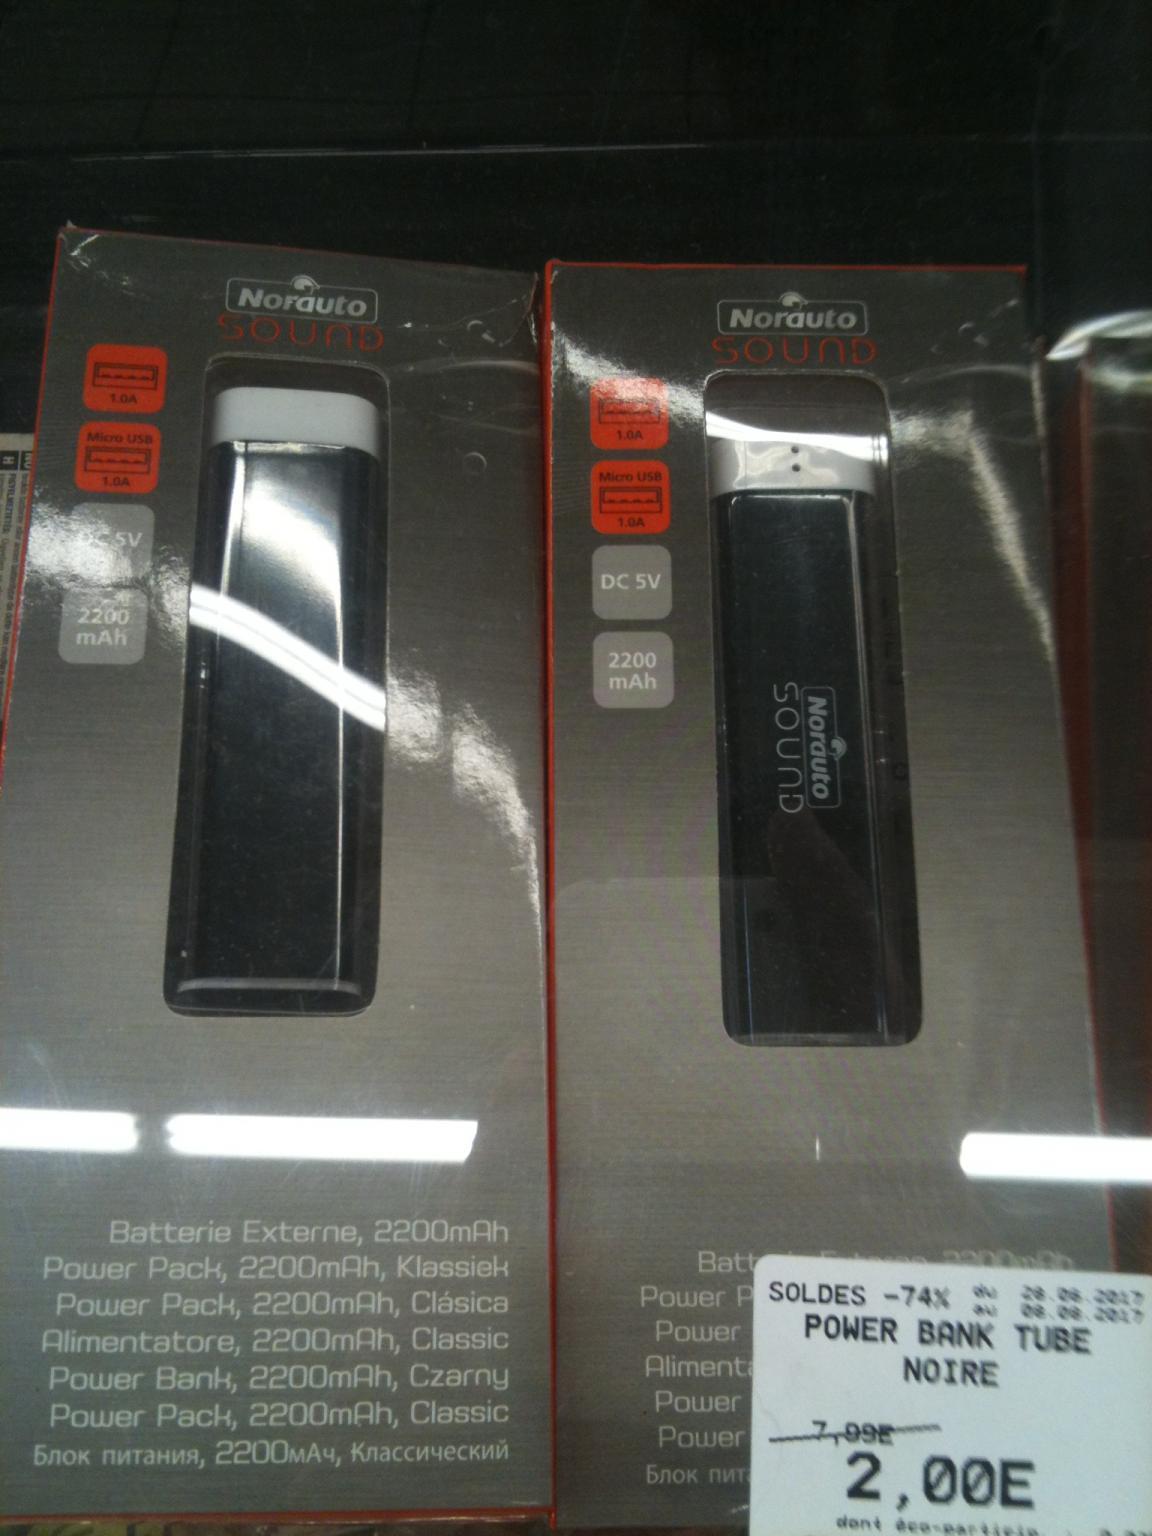 Batterie externe Norauto Sound - 2200 mAh